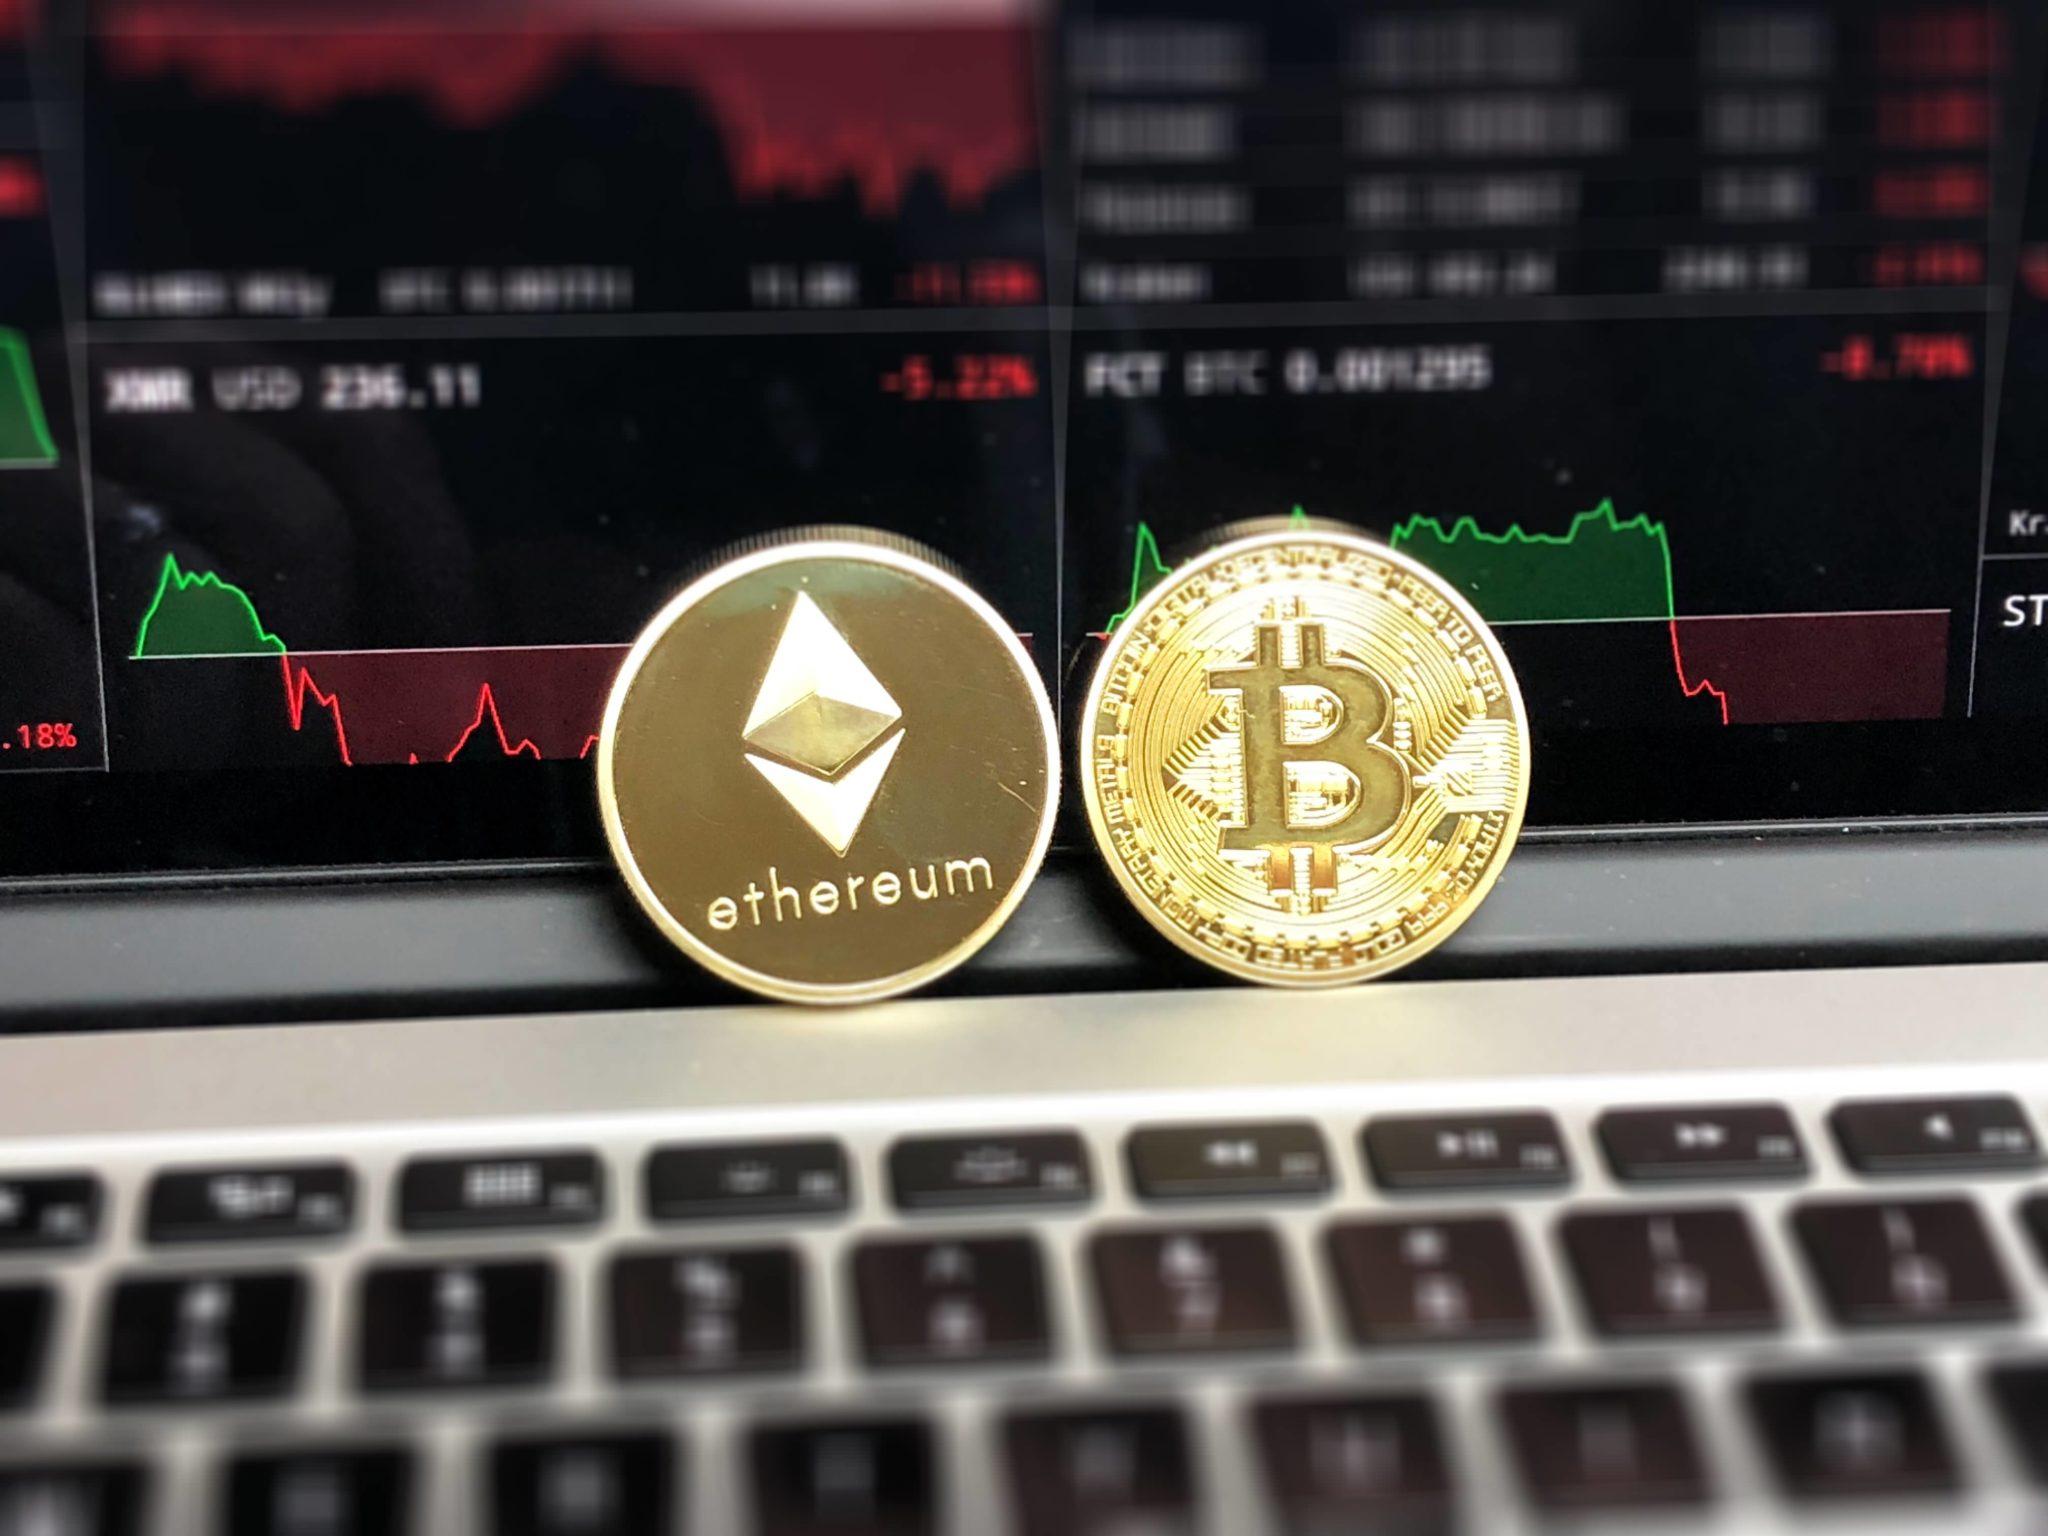 [ Bitcoin vs IOTA ] : Key differences & understanding Tangle vs Blockchain